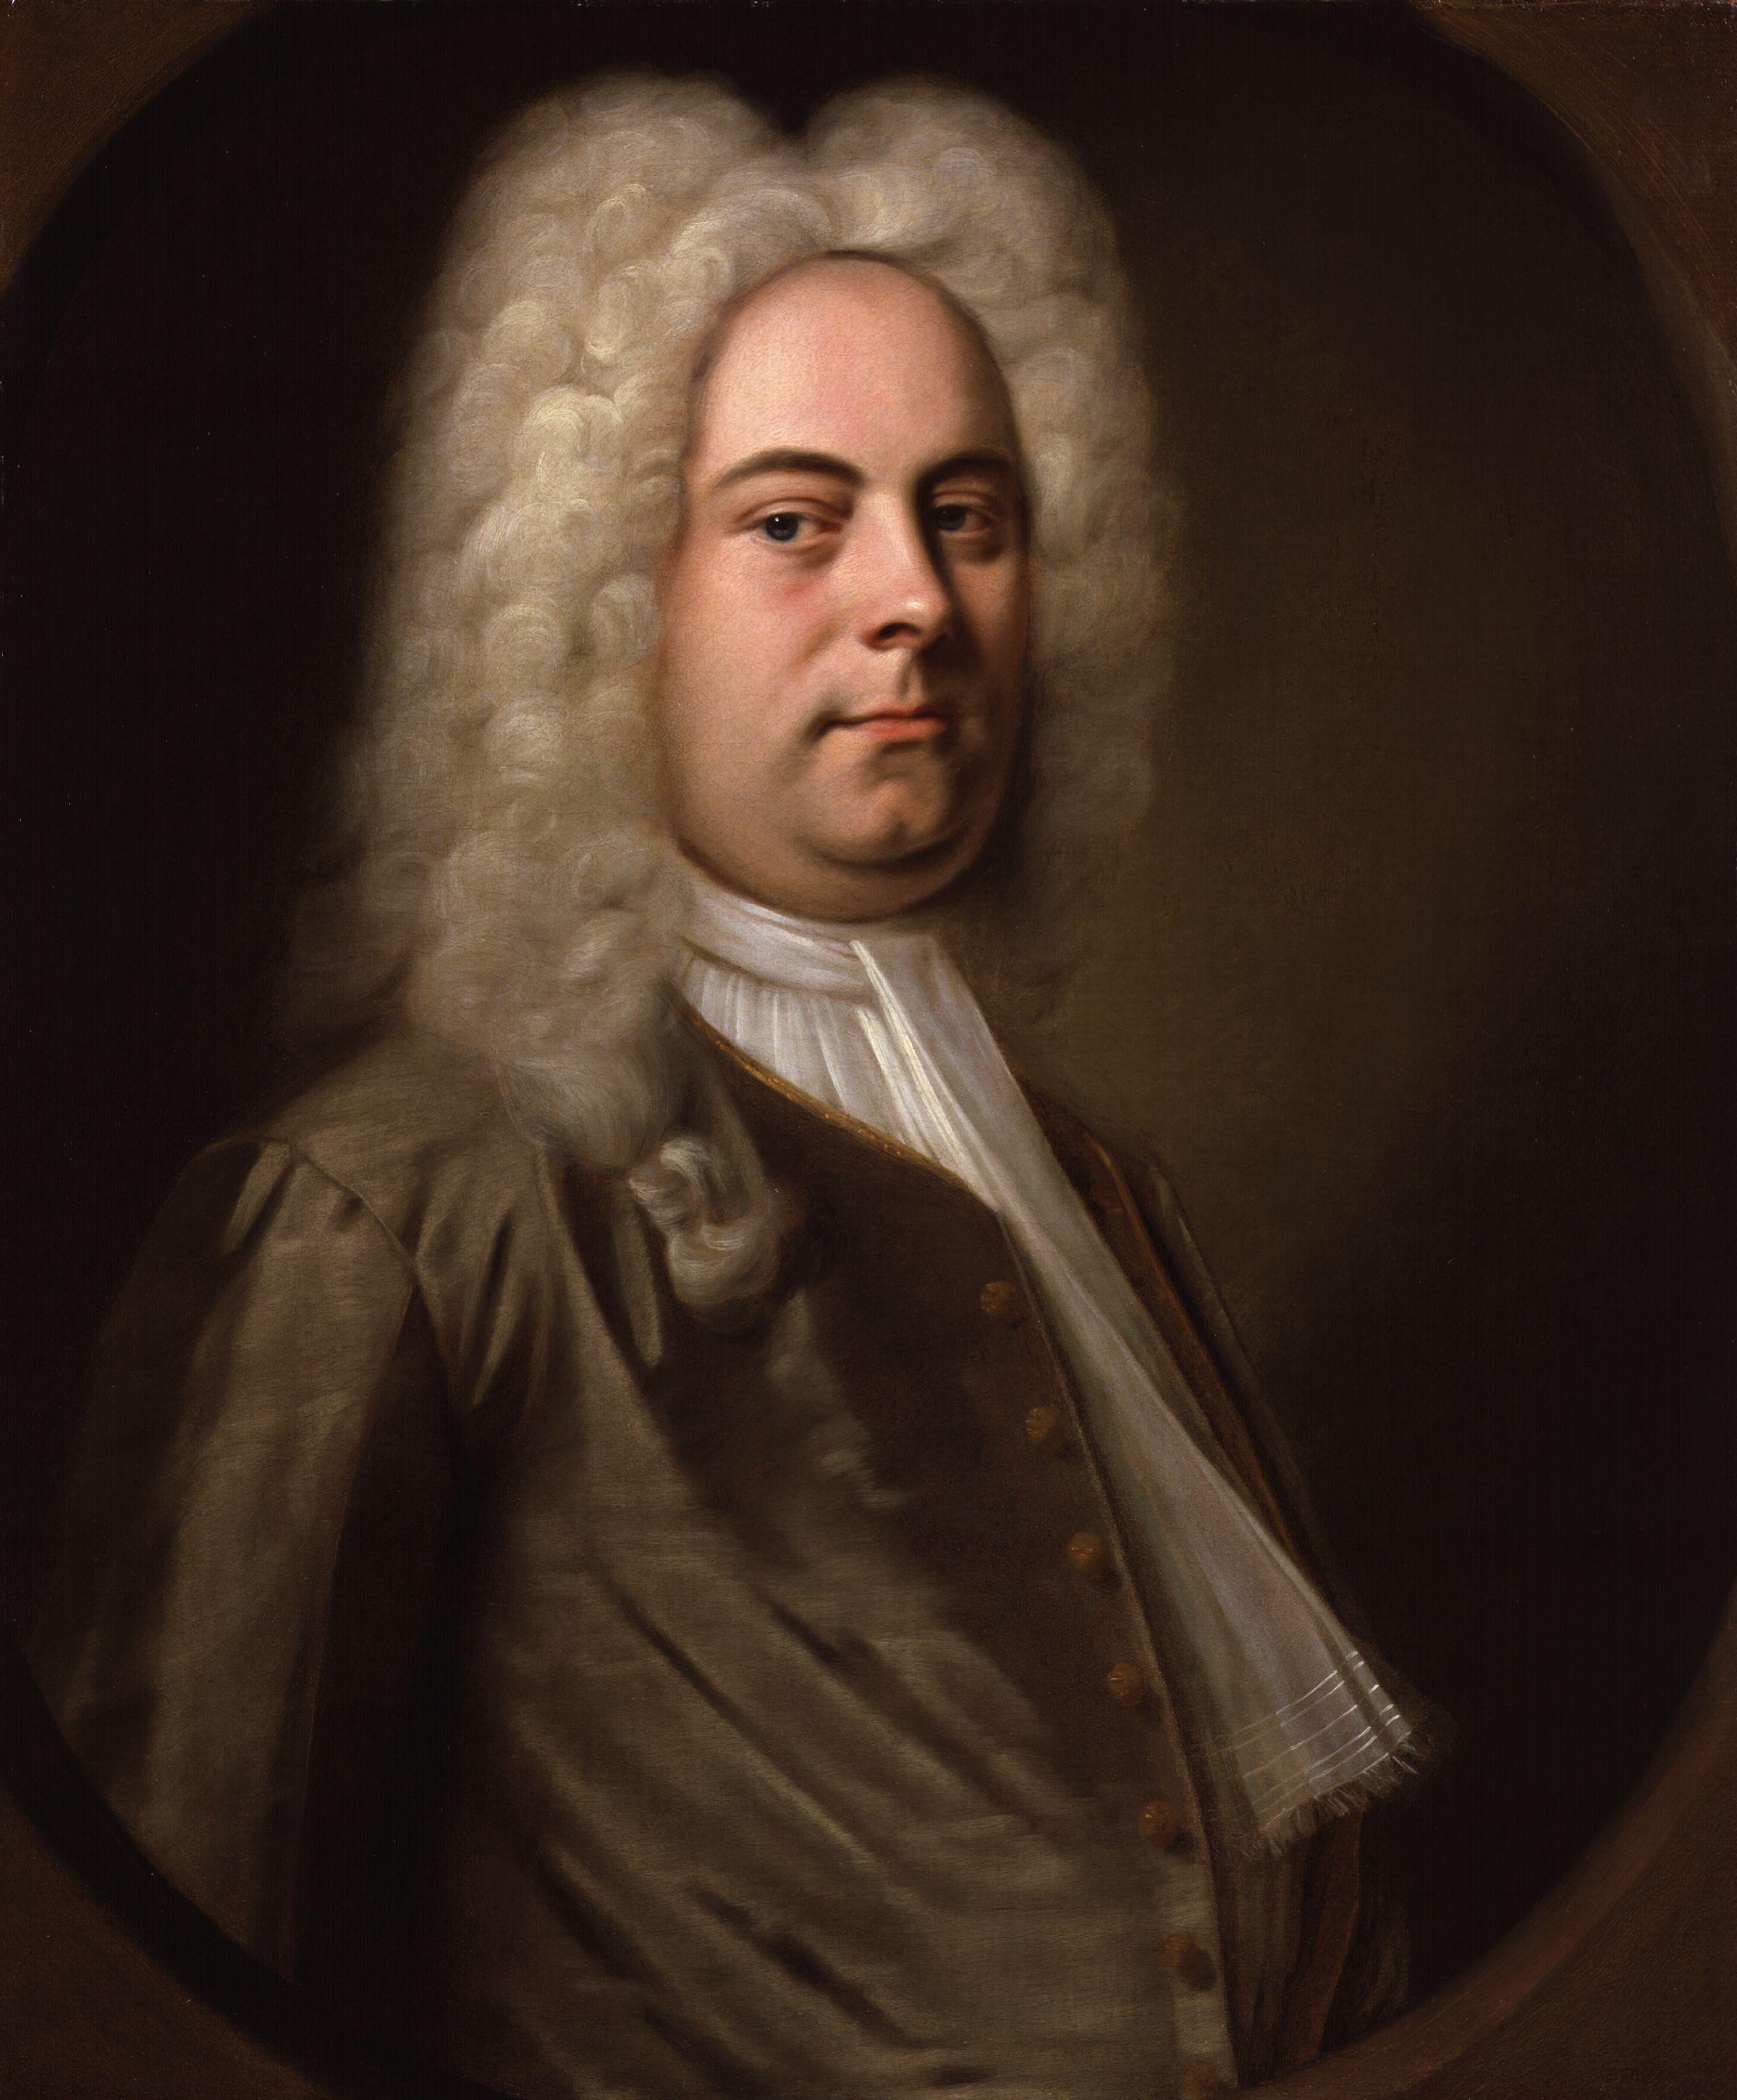 George_Frideric_Handel_by_Balthasar_Denner.jpg